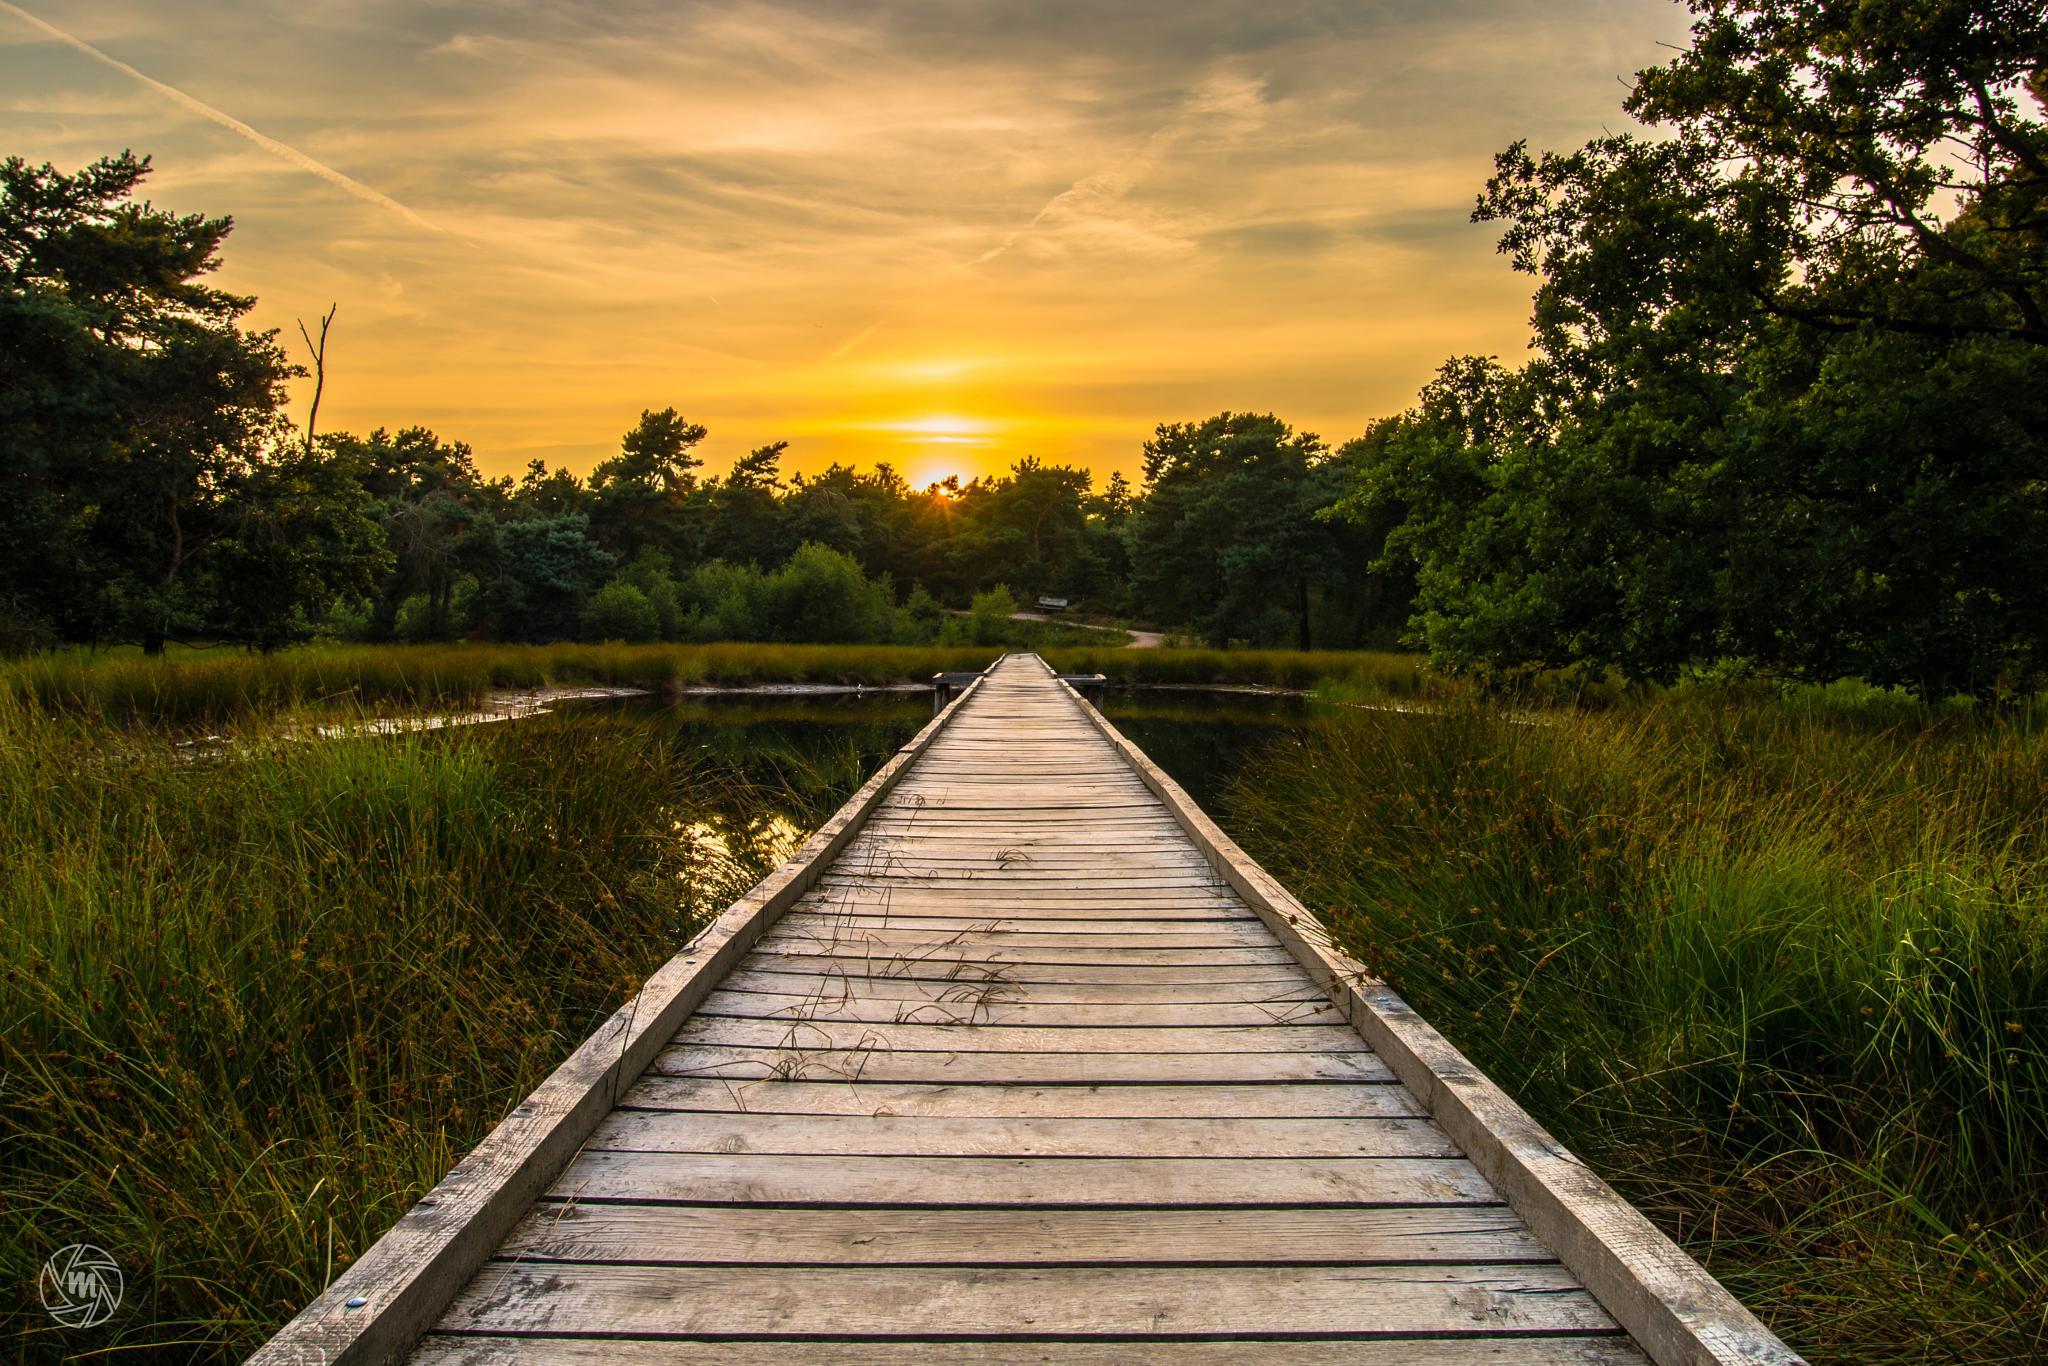 Sunset Walkway by William Mevissen